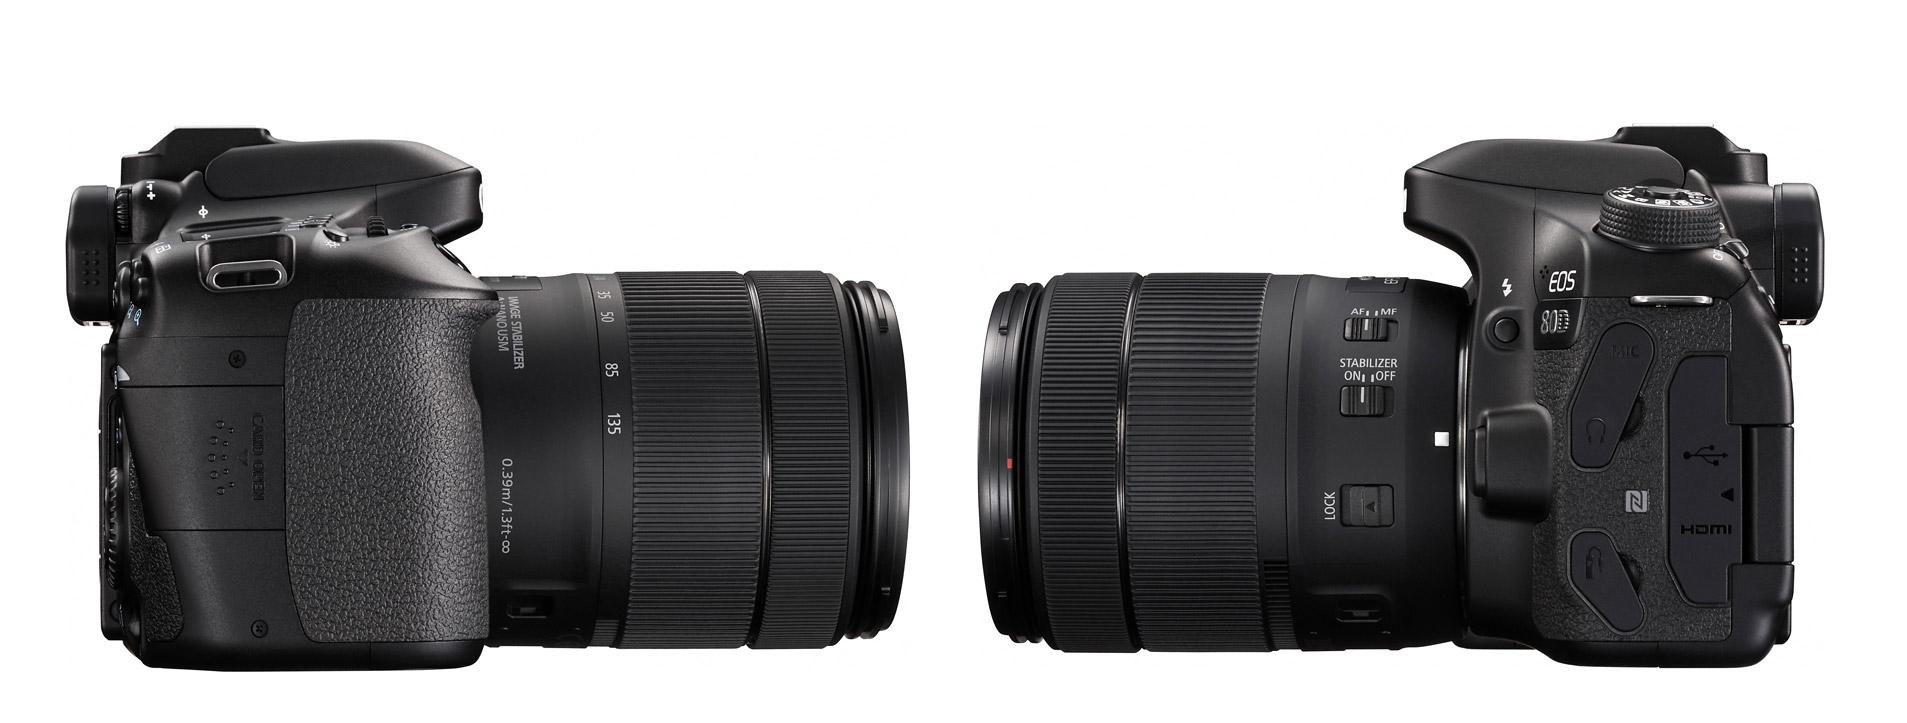 Canon-EOS-80D-sides